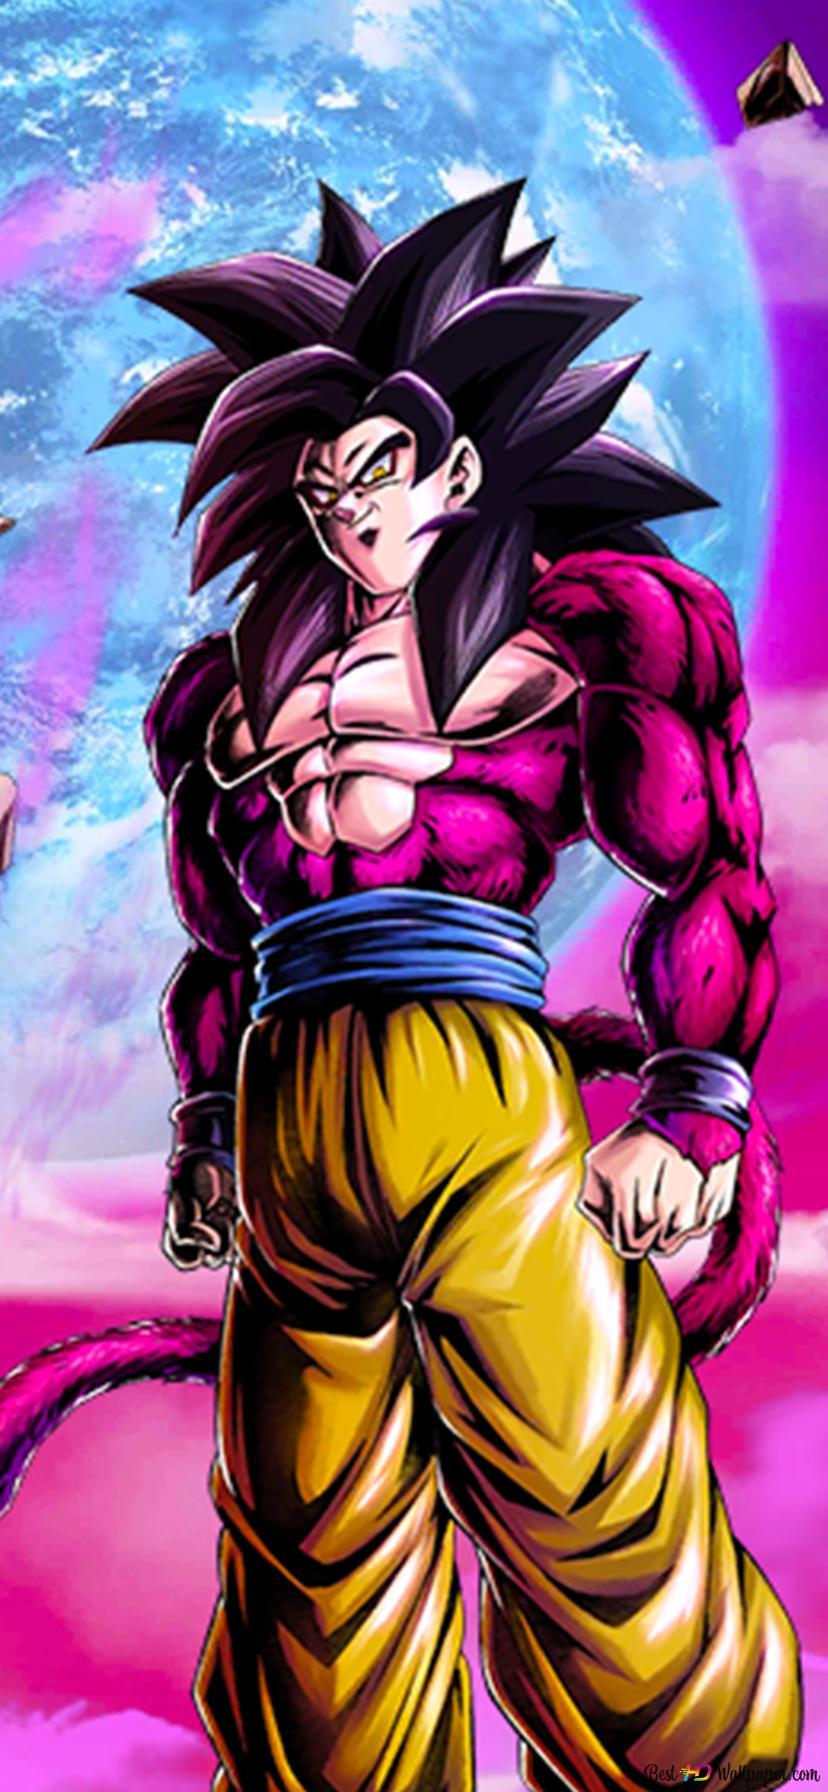 Goku Super Saiyan 4 From Dragon Ball Gt Dragon Ball Legends Arts For Desktop Hd Wallpaper Download